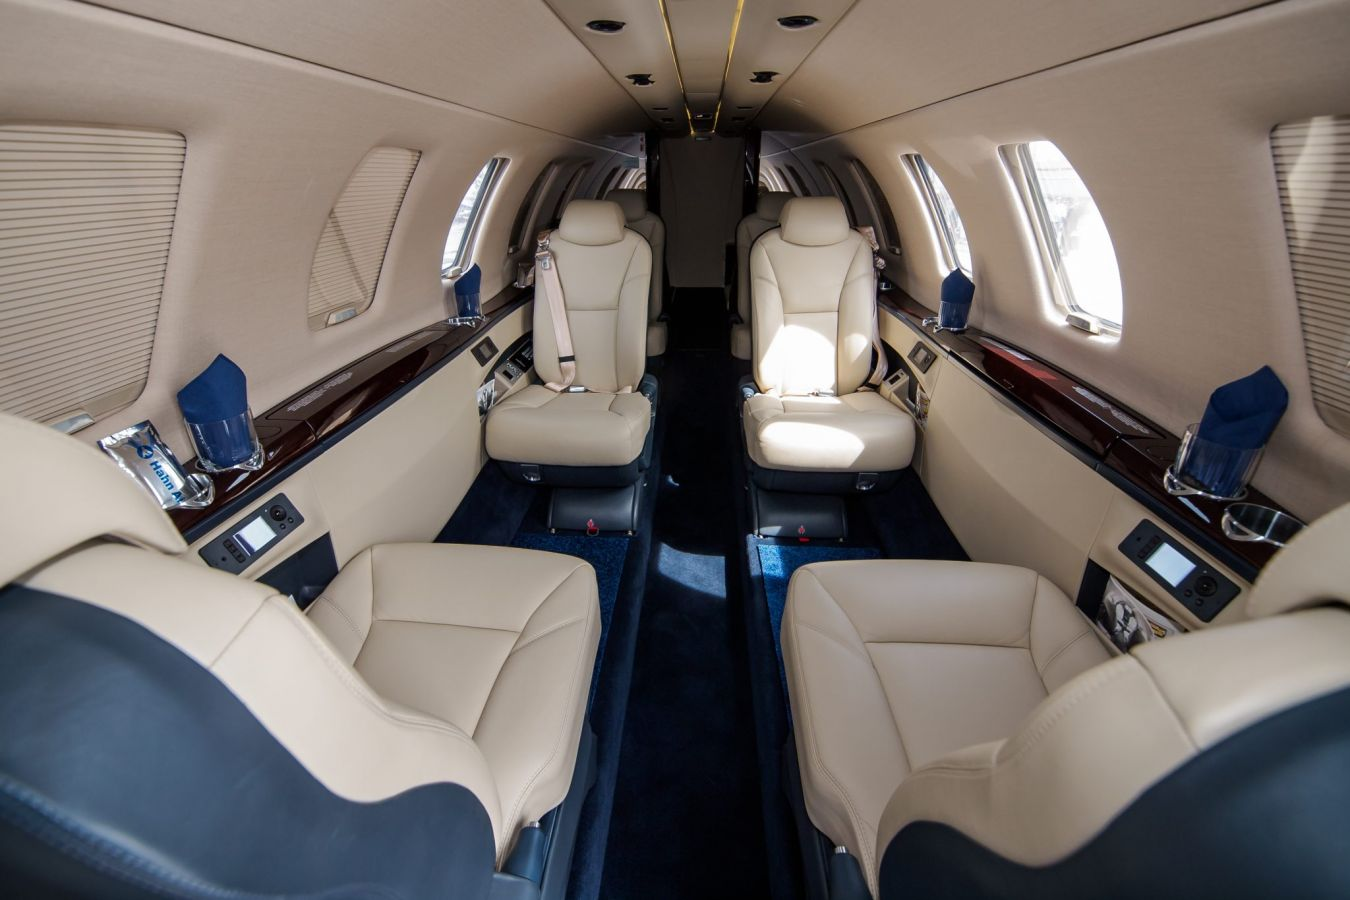 1 фото салон CessnaCitationCJ4 interior light jets - Cessna Citation CJ4